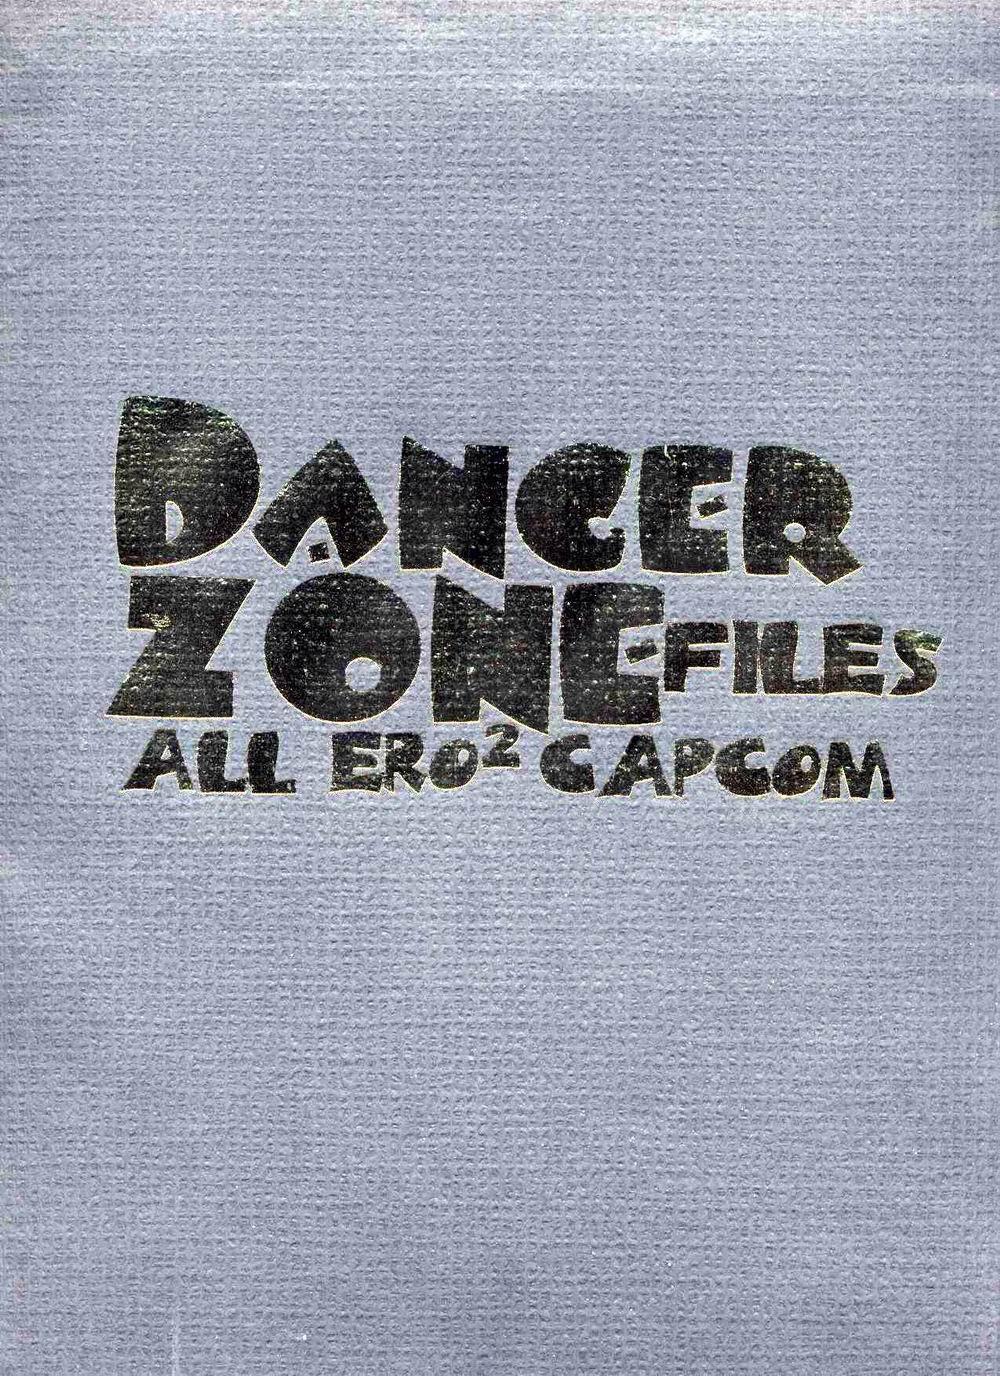 ALL ERO ERO CAPCOM DANGER ZONE 0